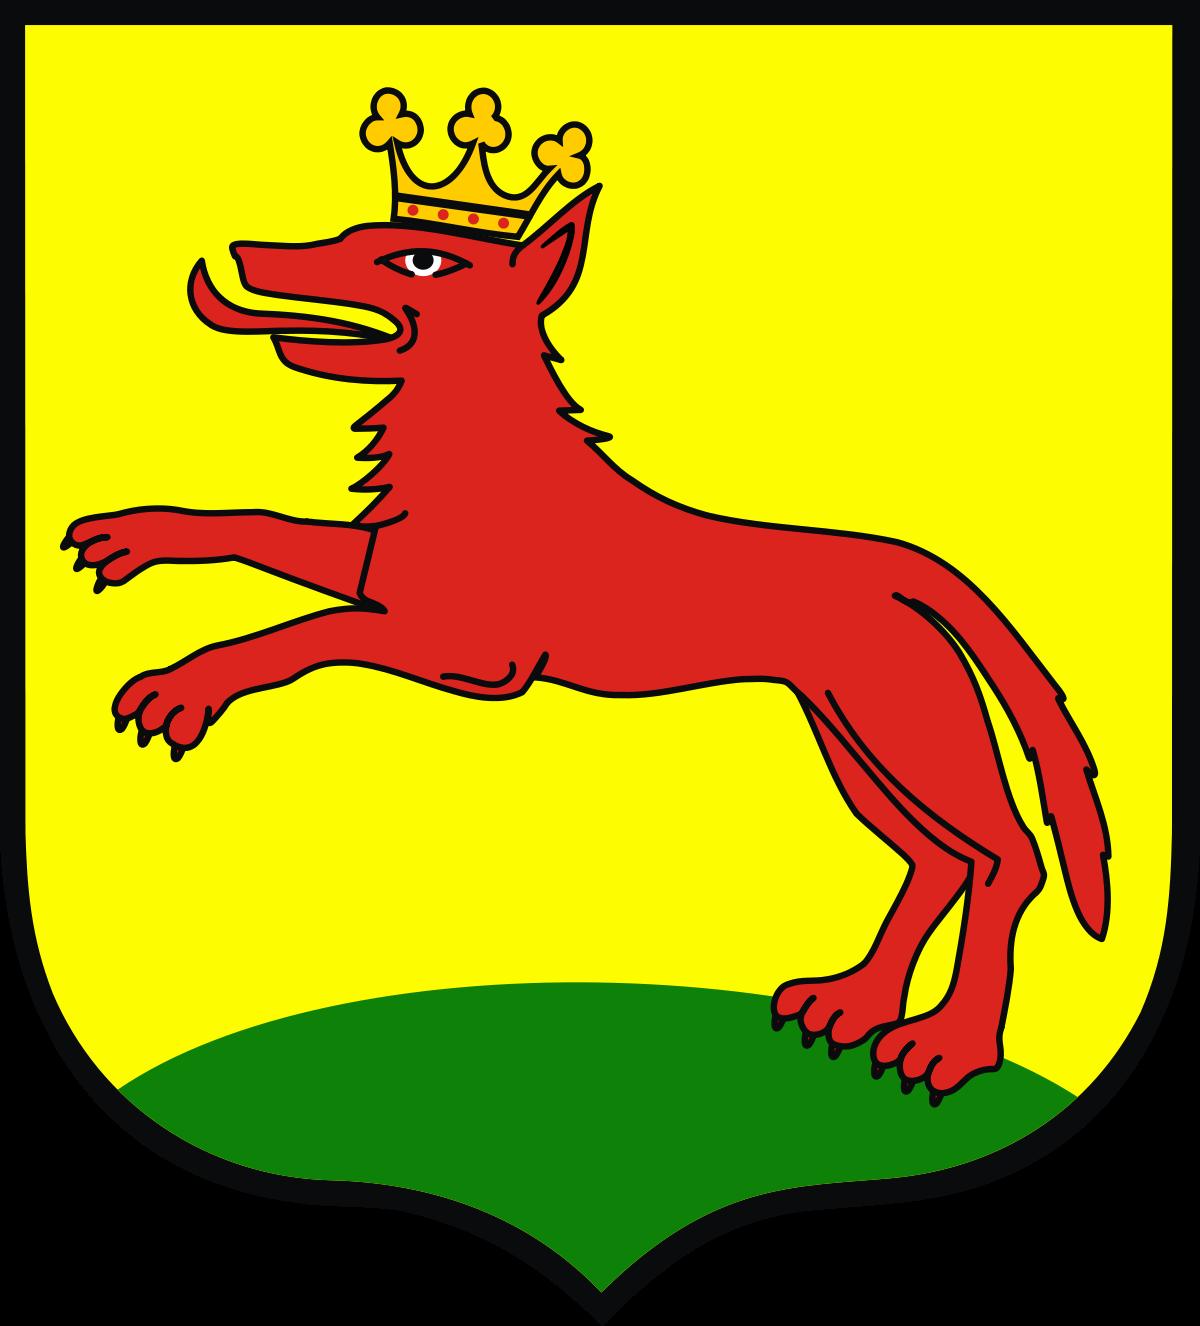 Wolves in heraldry.